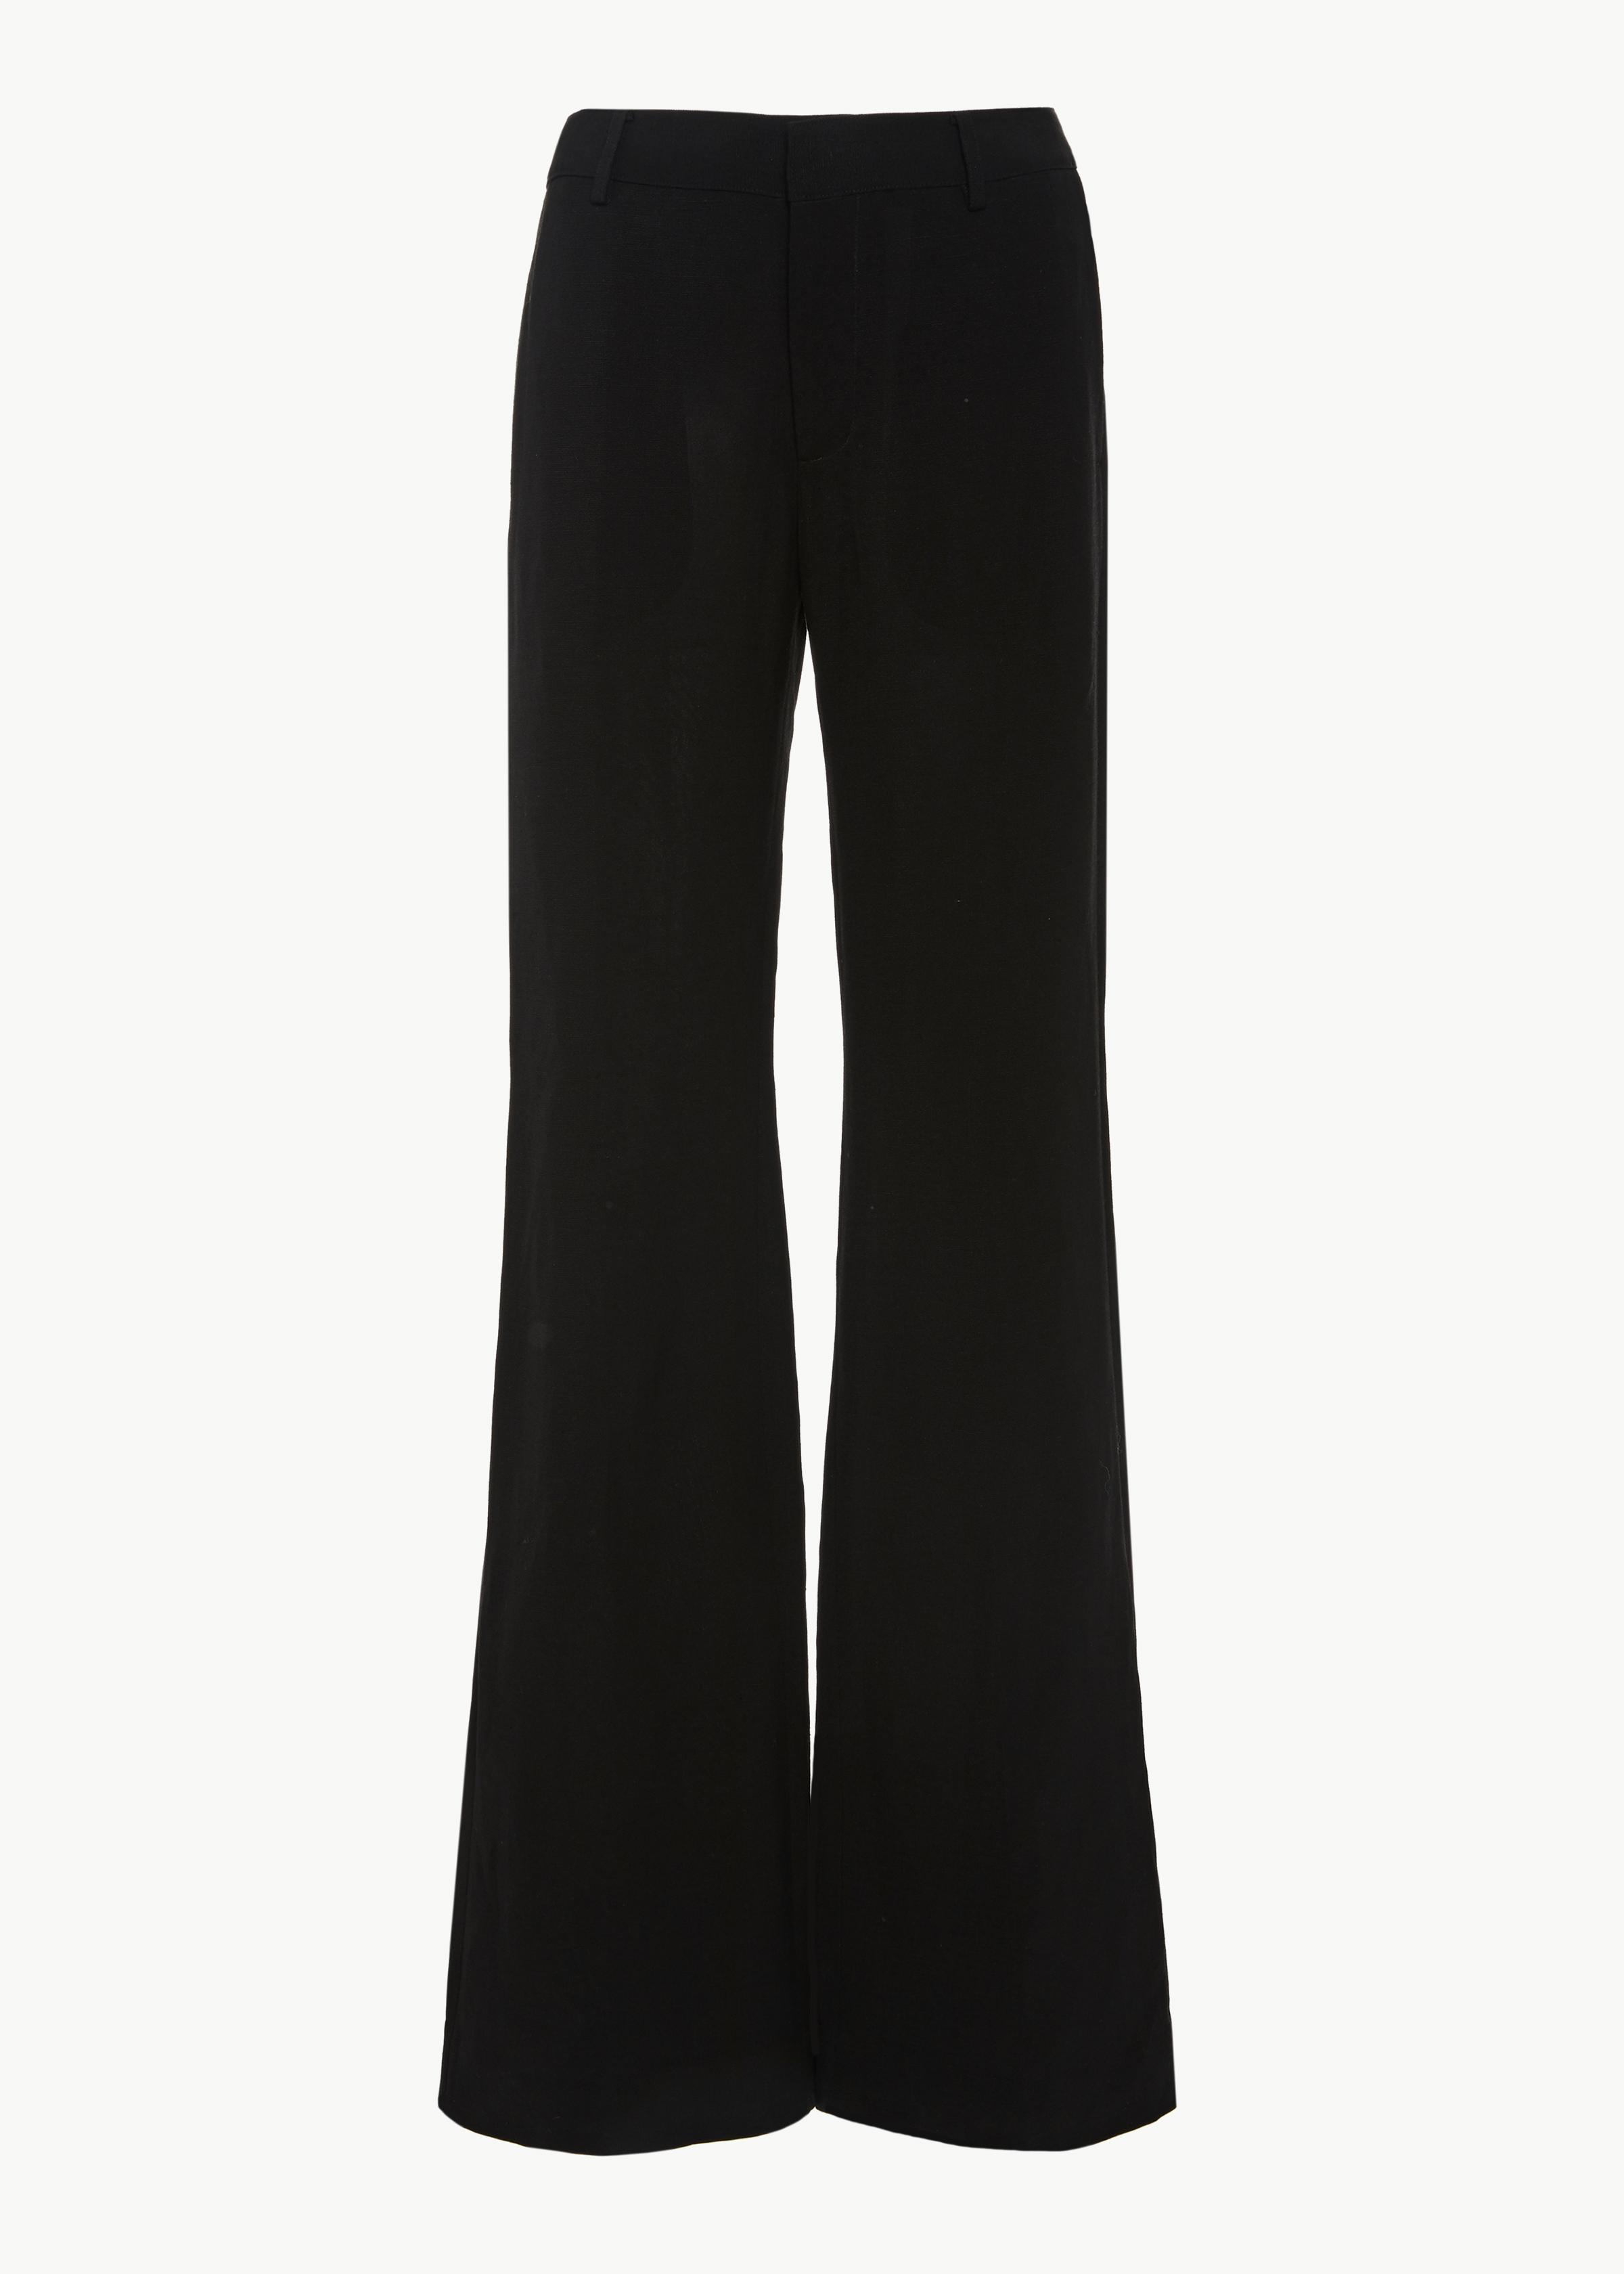 Flare Leg Trouser in Viscose Linen - Black - CO